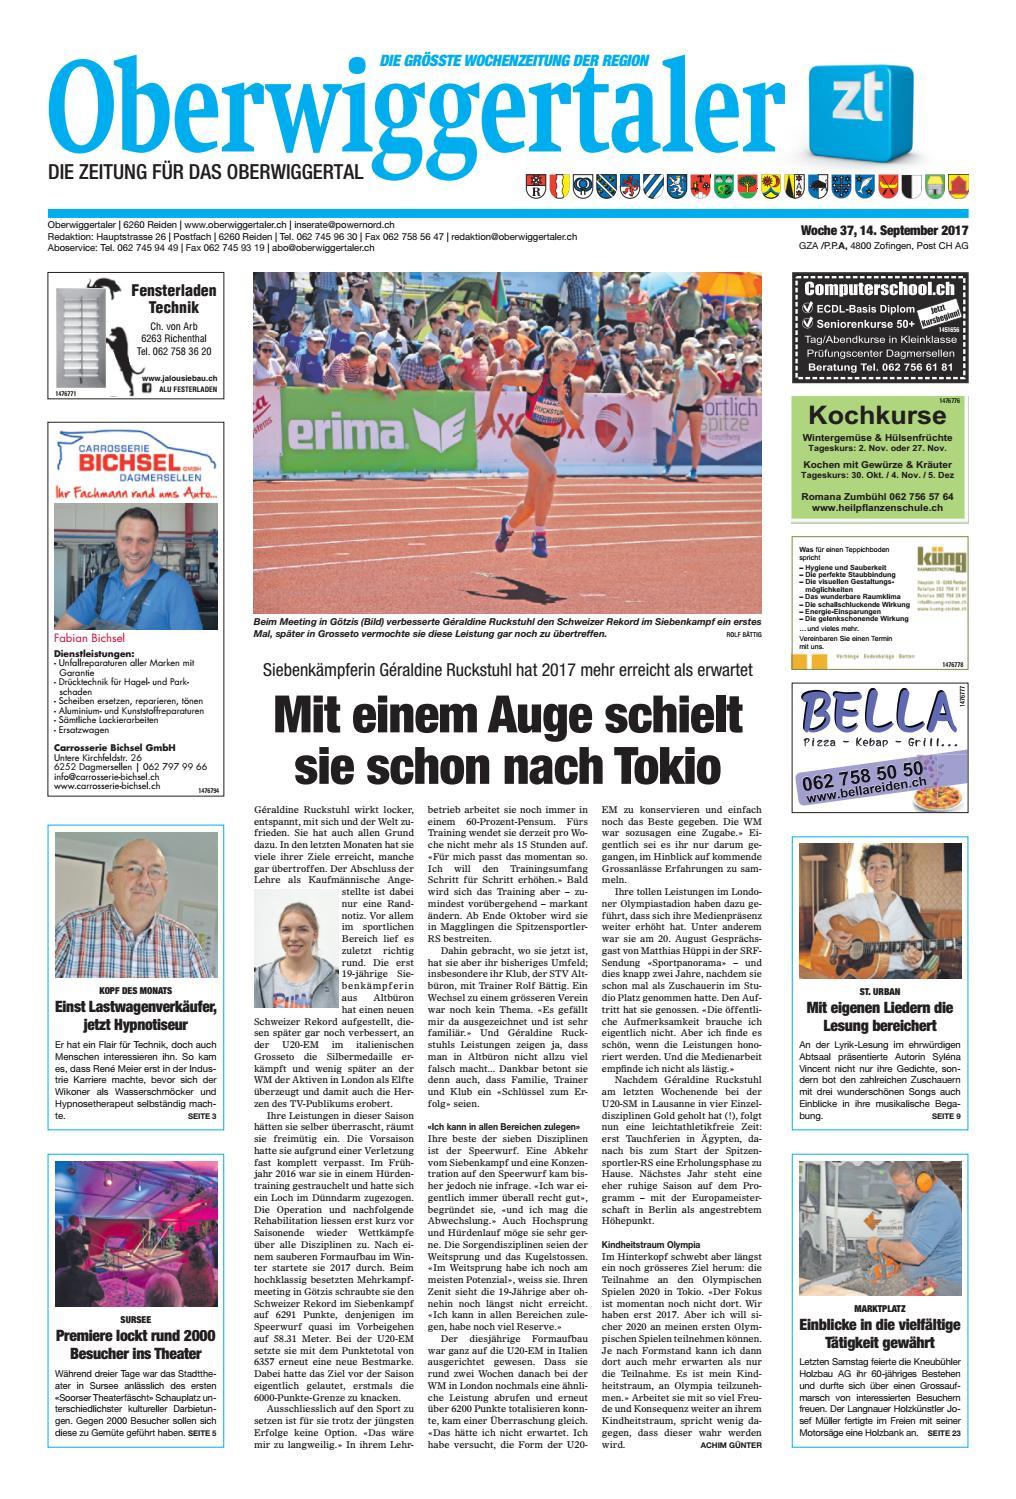 Oberwiggertaler 3717 by ZT Medien AG issuu